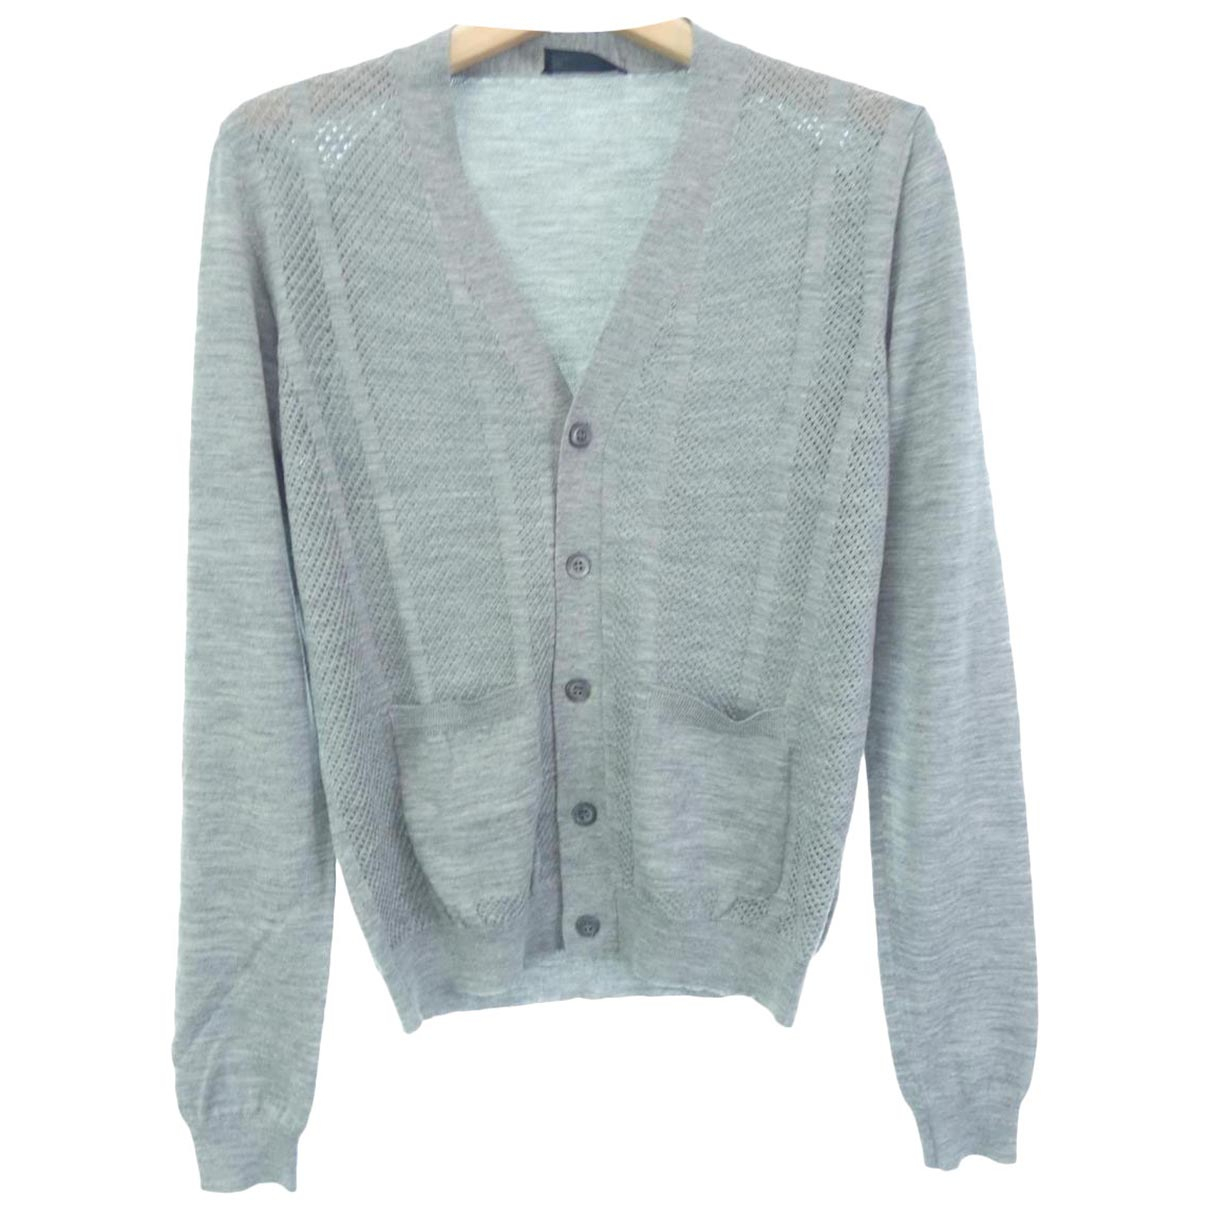 Prada - Tee shirts   pour homme en coton - gris